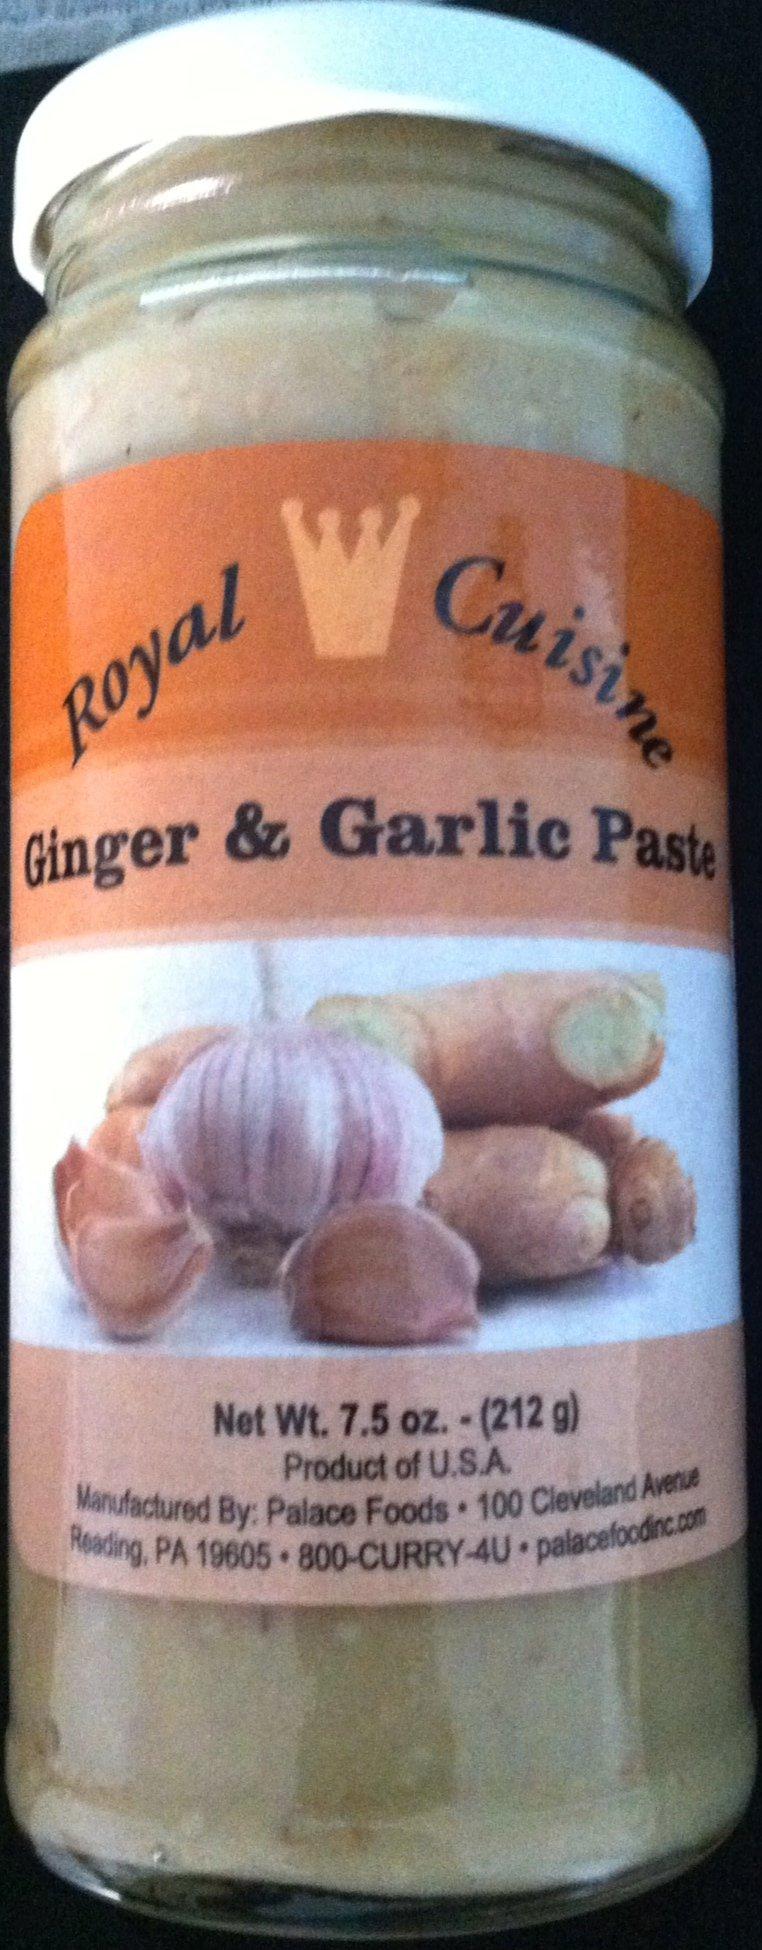 Royal Cuisine Ginger and Garlic Paste 7.5 Oz 3-Pack-Vegan by Royal Cuisine Ginger and Garlic Paste 7.5 Oz 3-Pack-Vegan